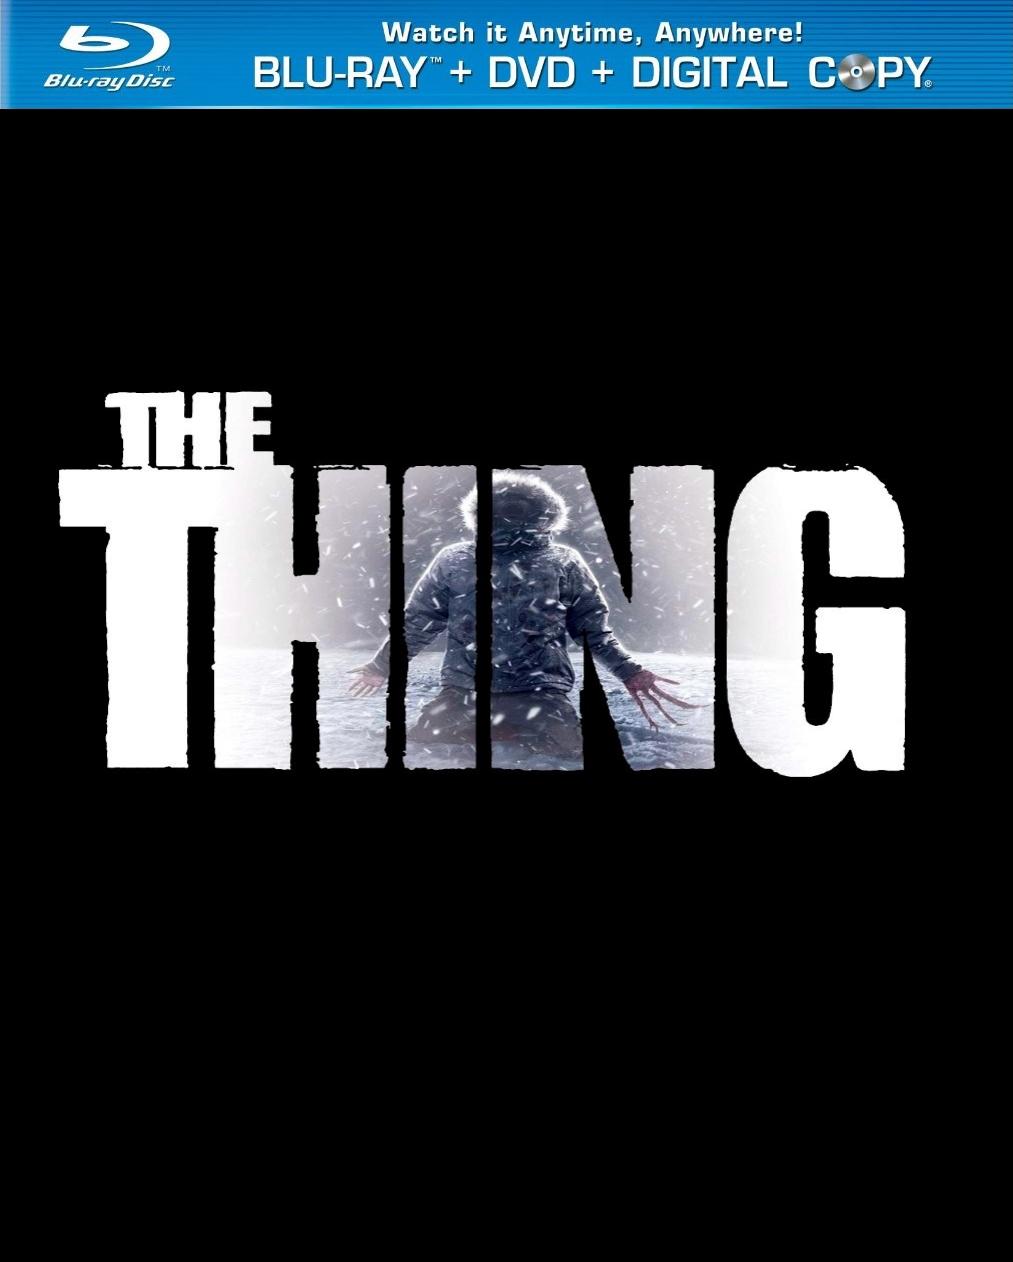 La Cosa: The Thing (2011) .mkv BluRay Rip 1080p x264 AC3 DTS - ITA-ENG